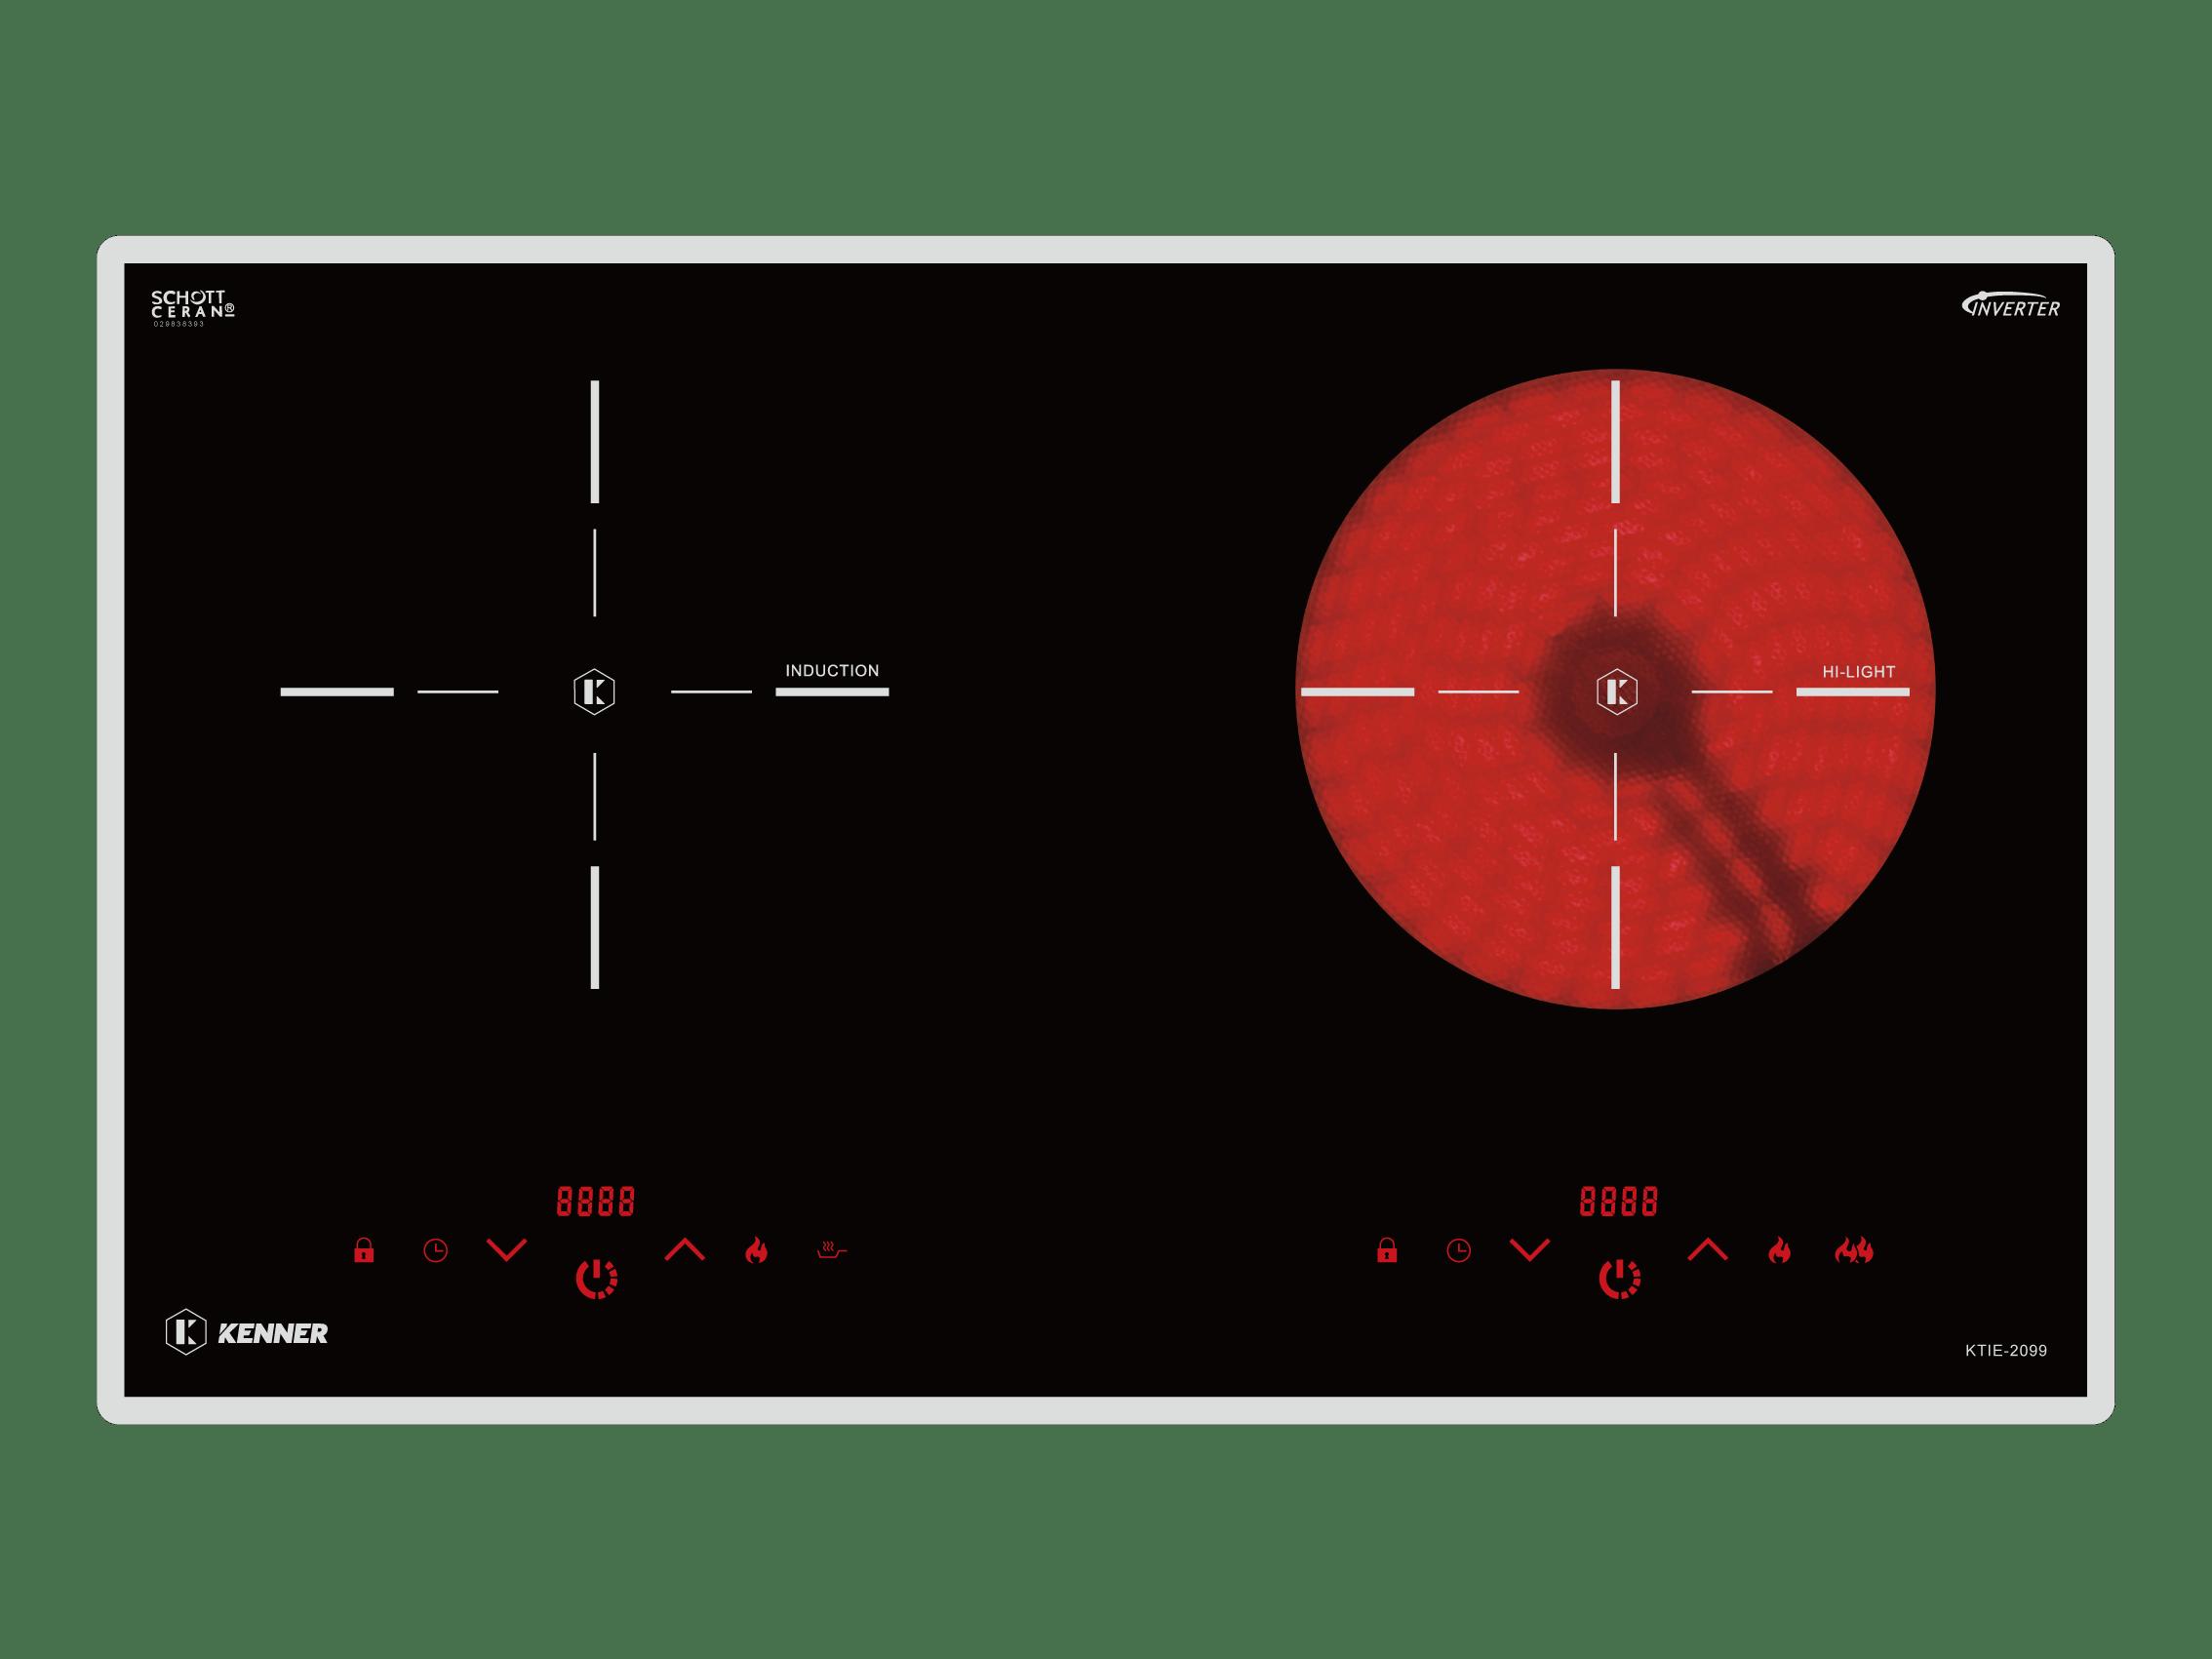 Bếp kết hợp KTIE-2099